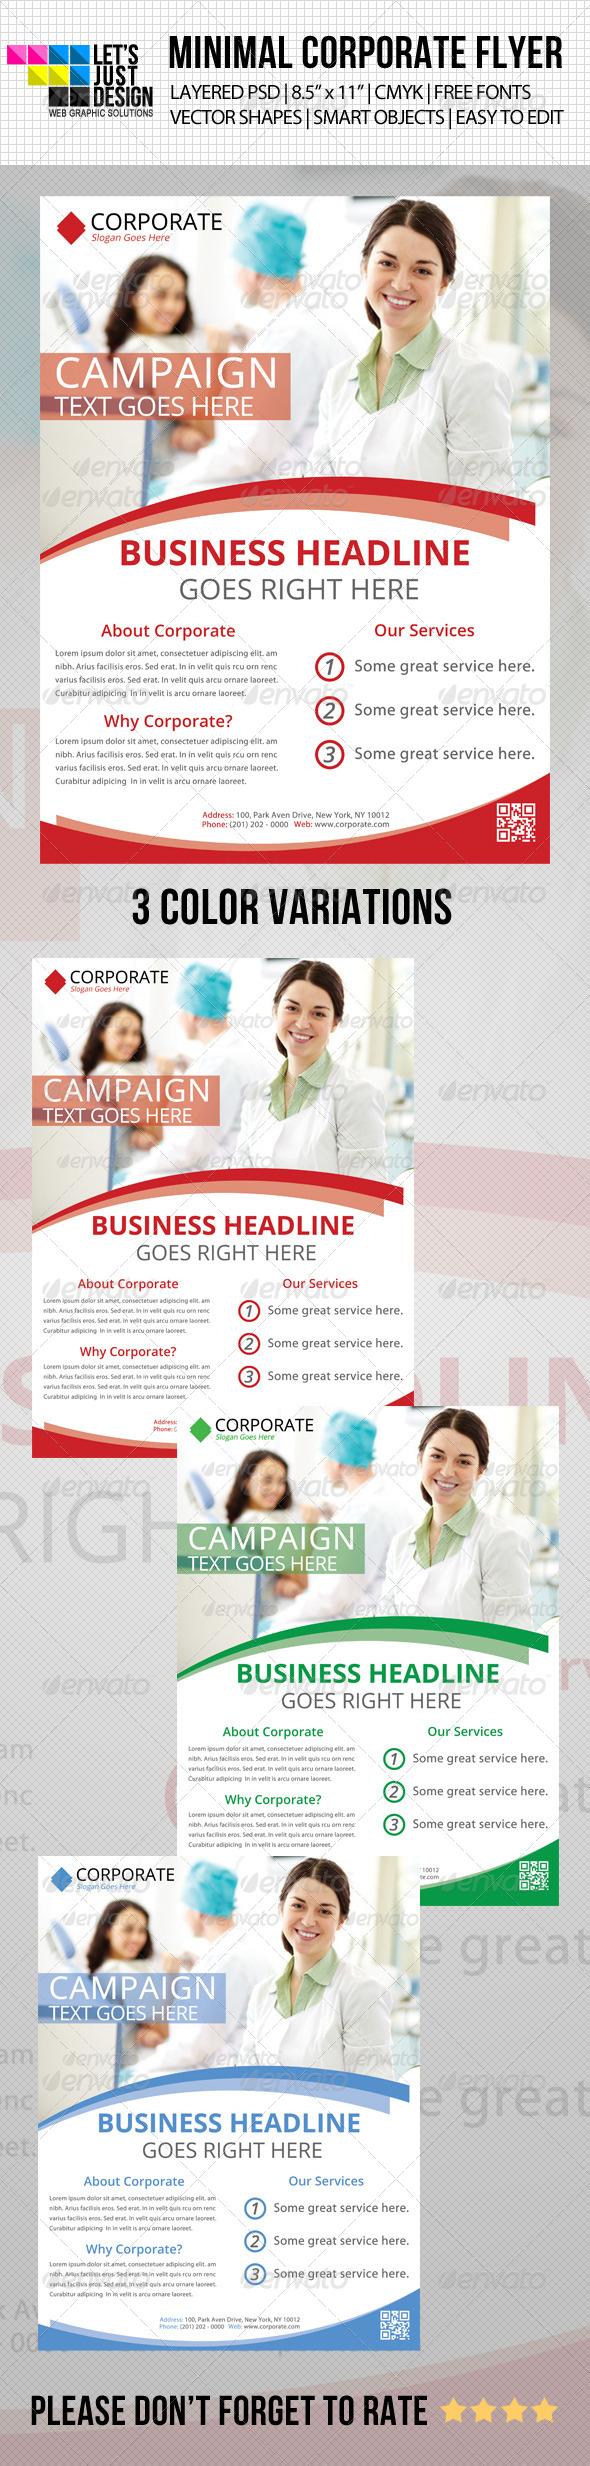 GraphicRiver Minimal Corporate Flyer 4786908